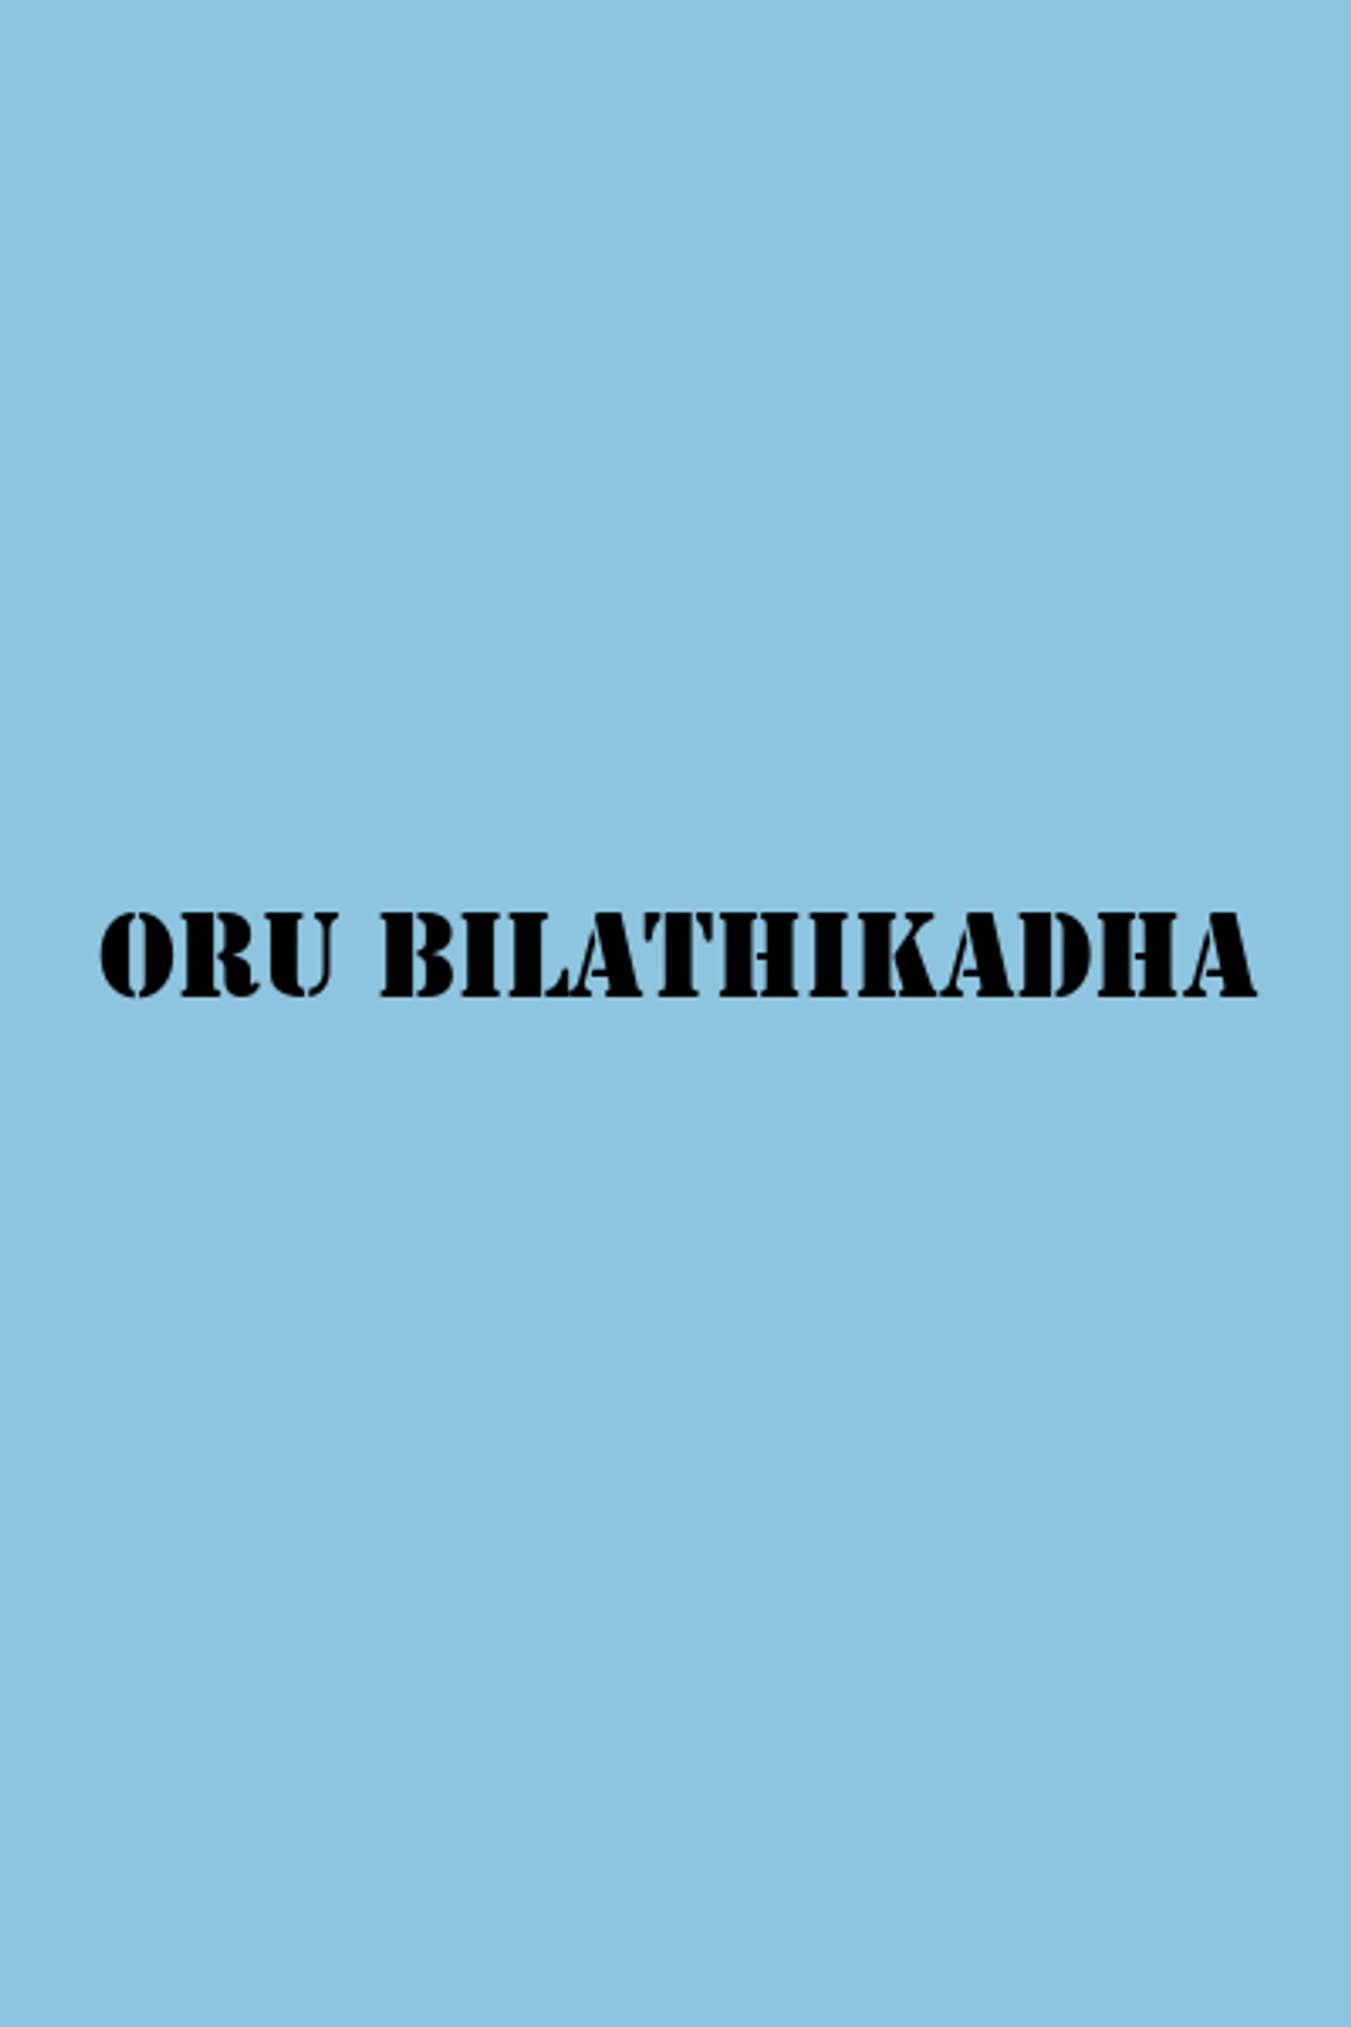 Oru Bilathikadha